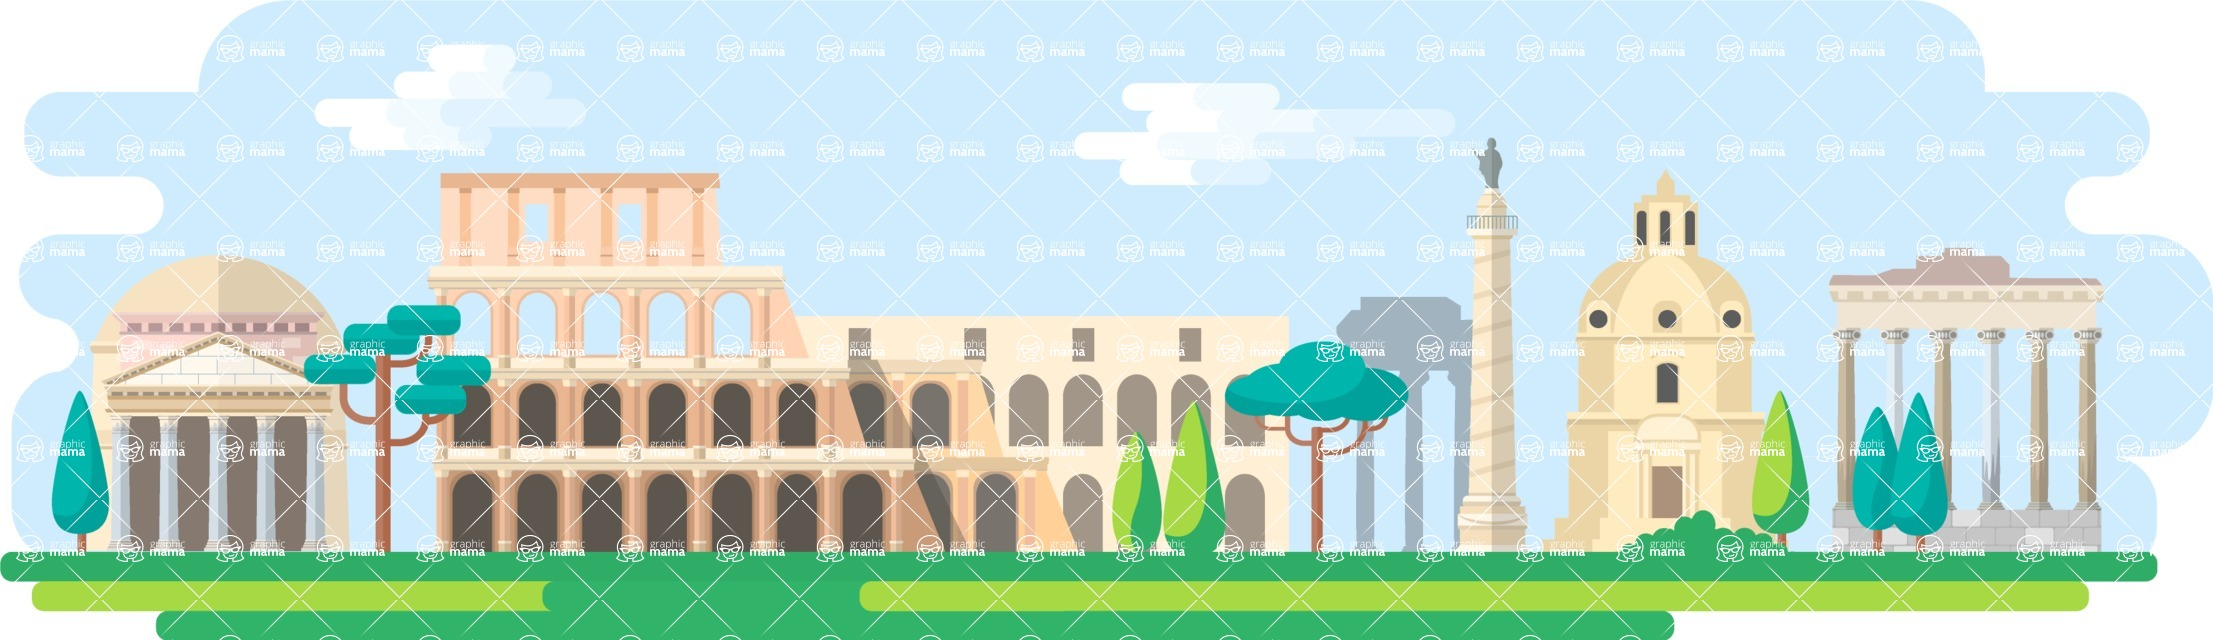 Rome Wide Landscape